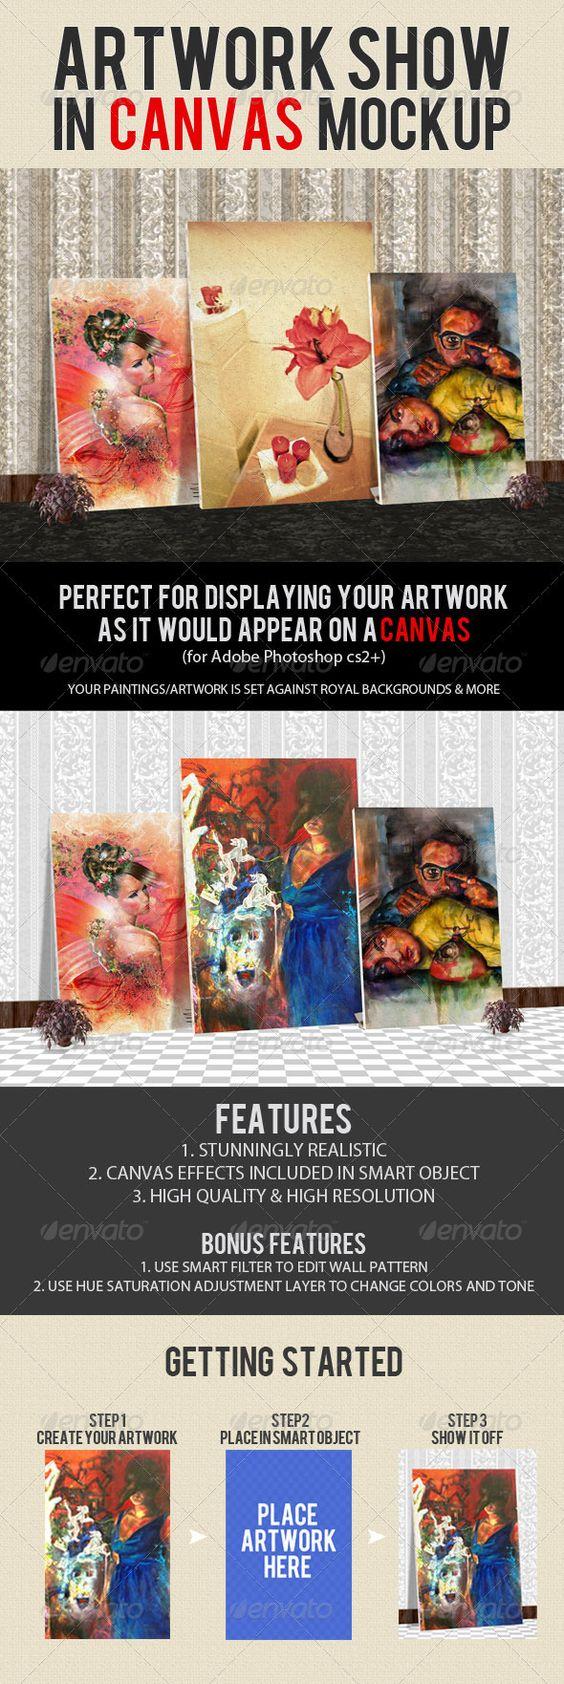 Artwork Show Mockup On Canvas